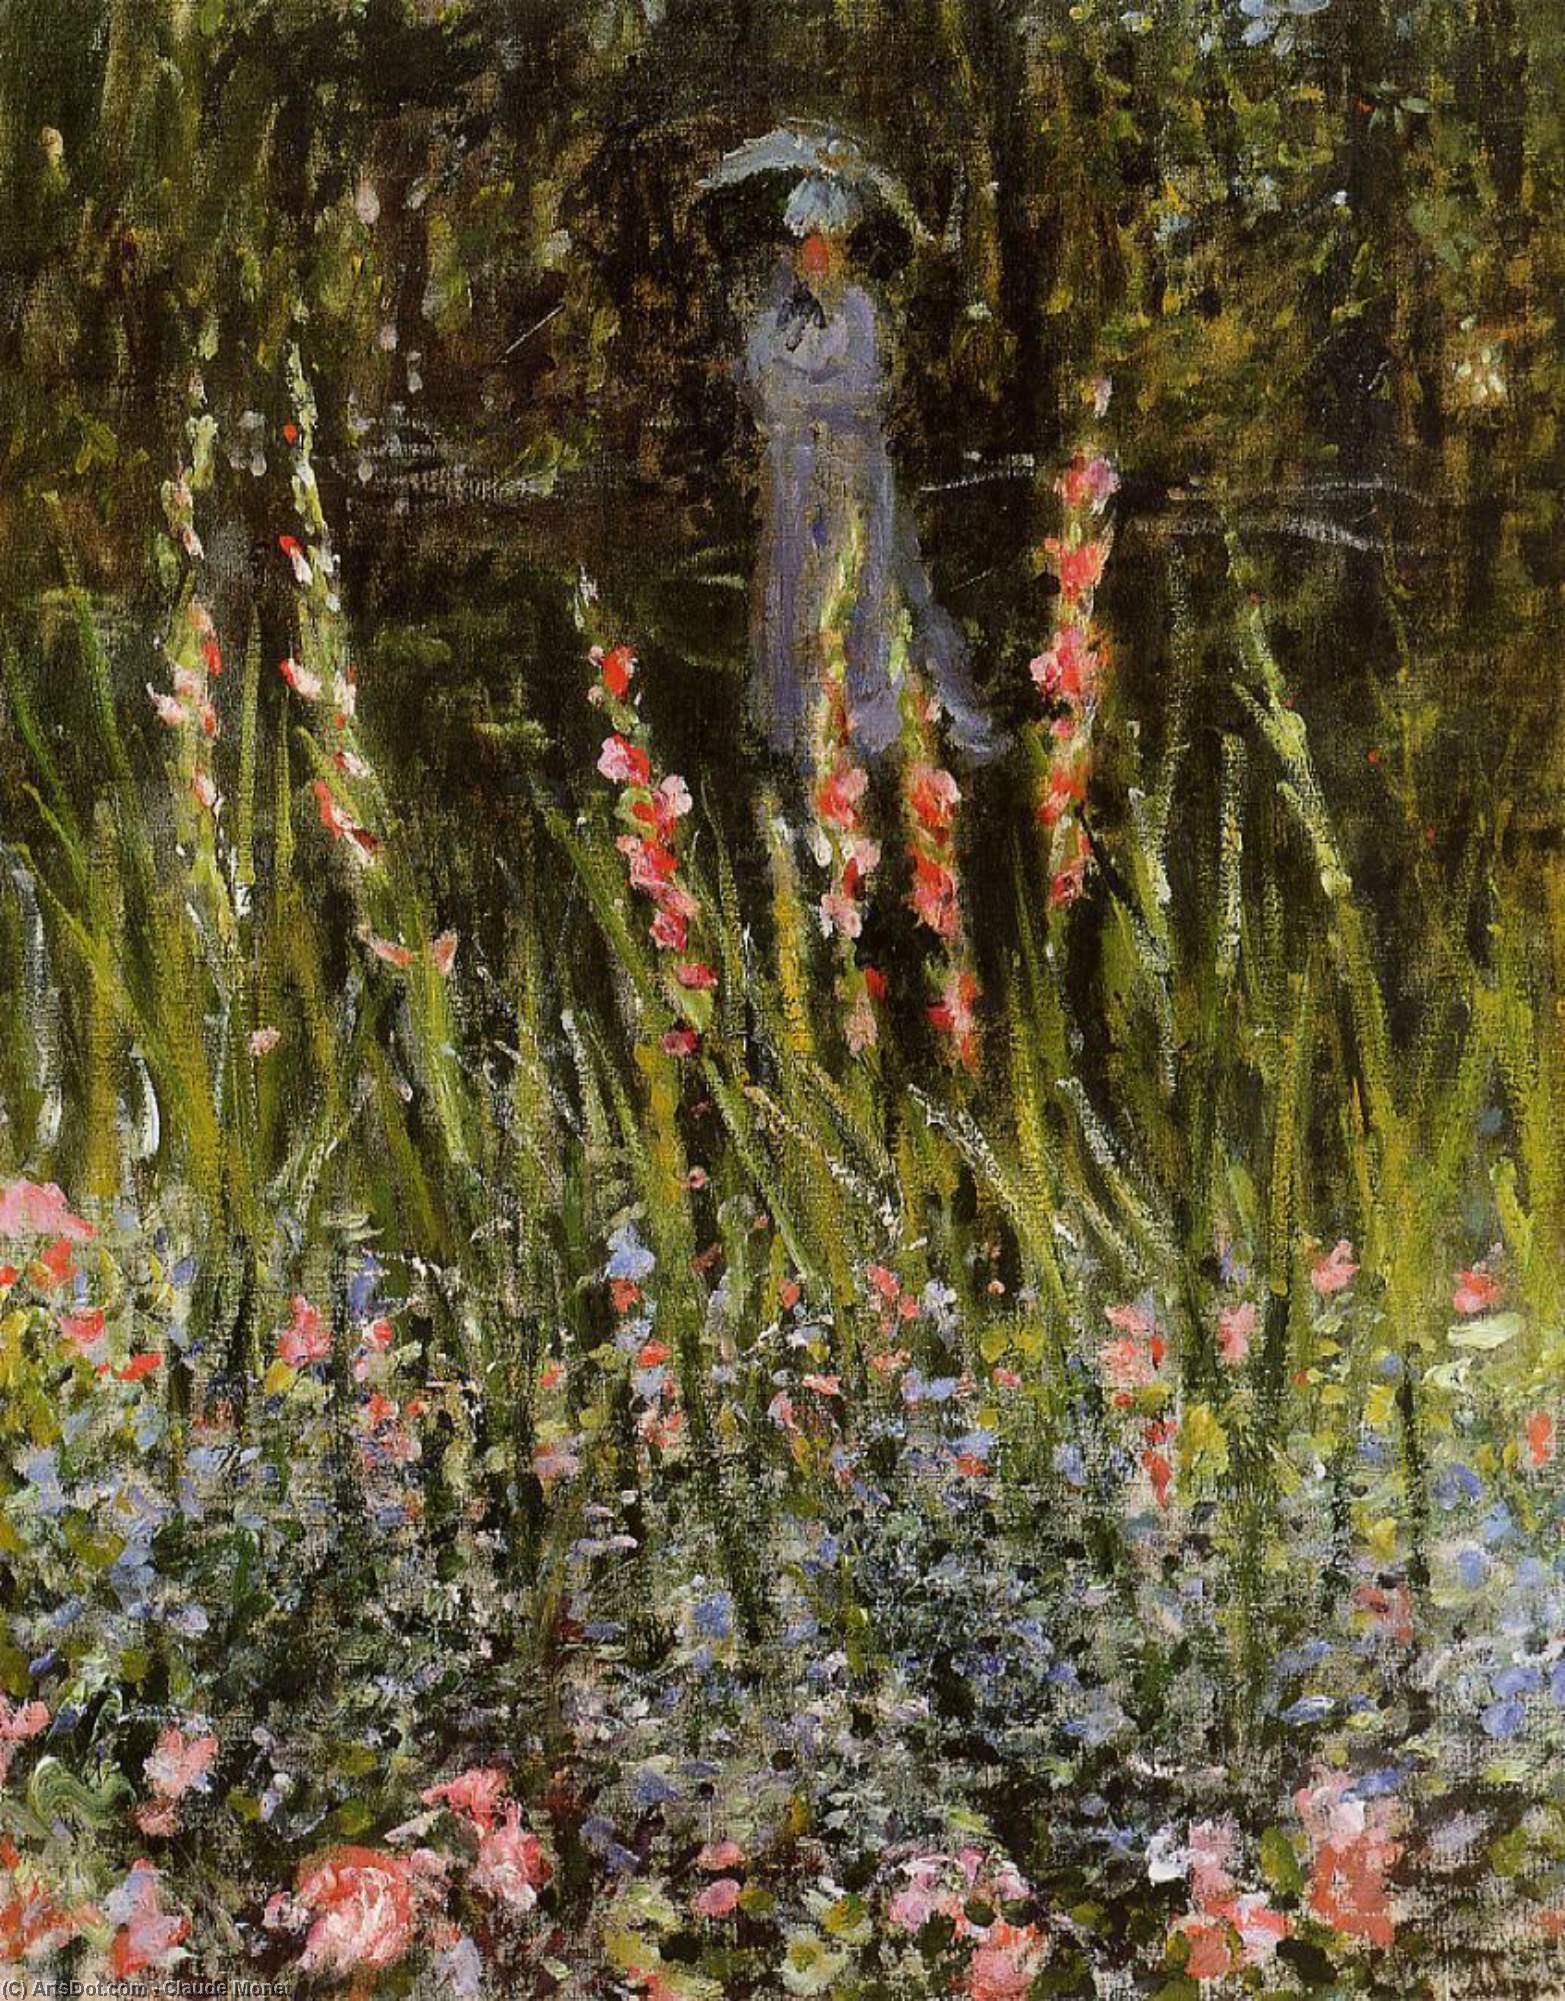 пейзаж < Сад с гладиолусами >:: Клод Моне, описание картины - Claude Monet фото